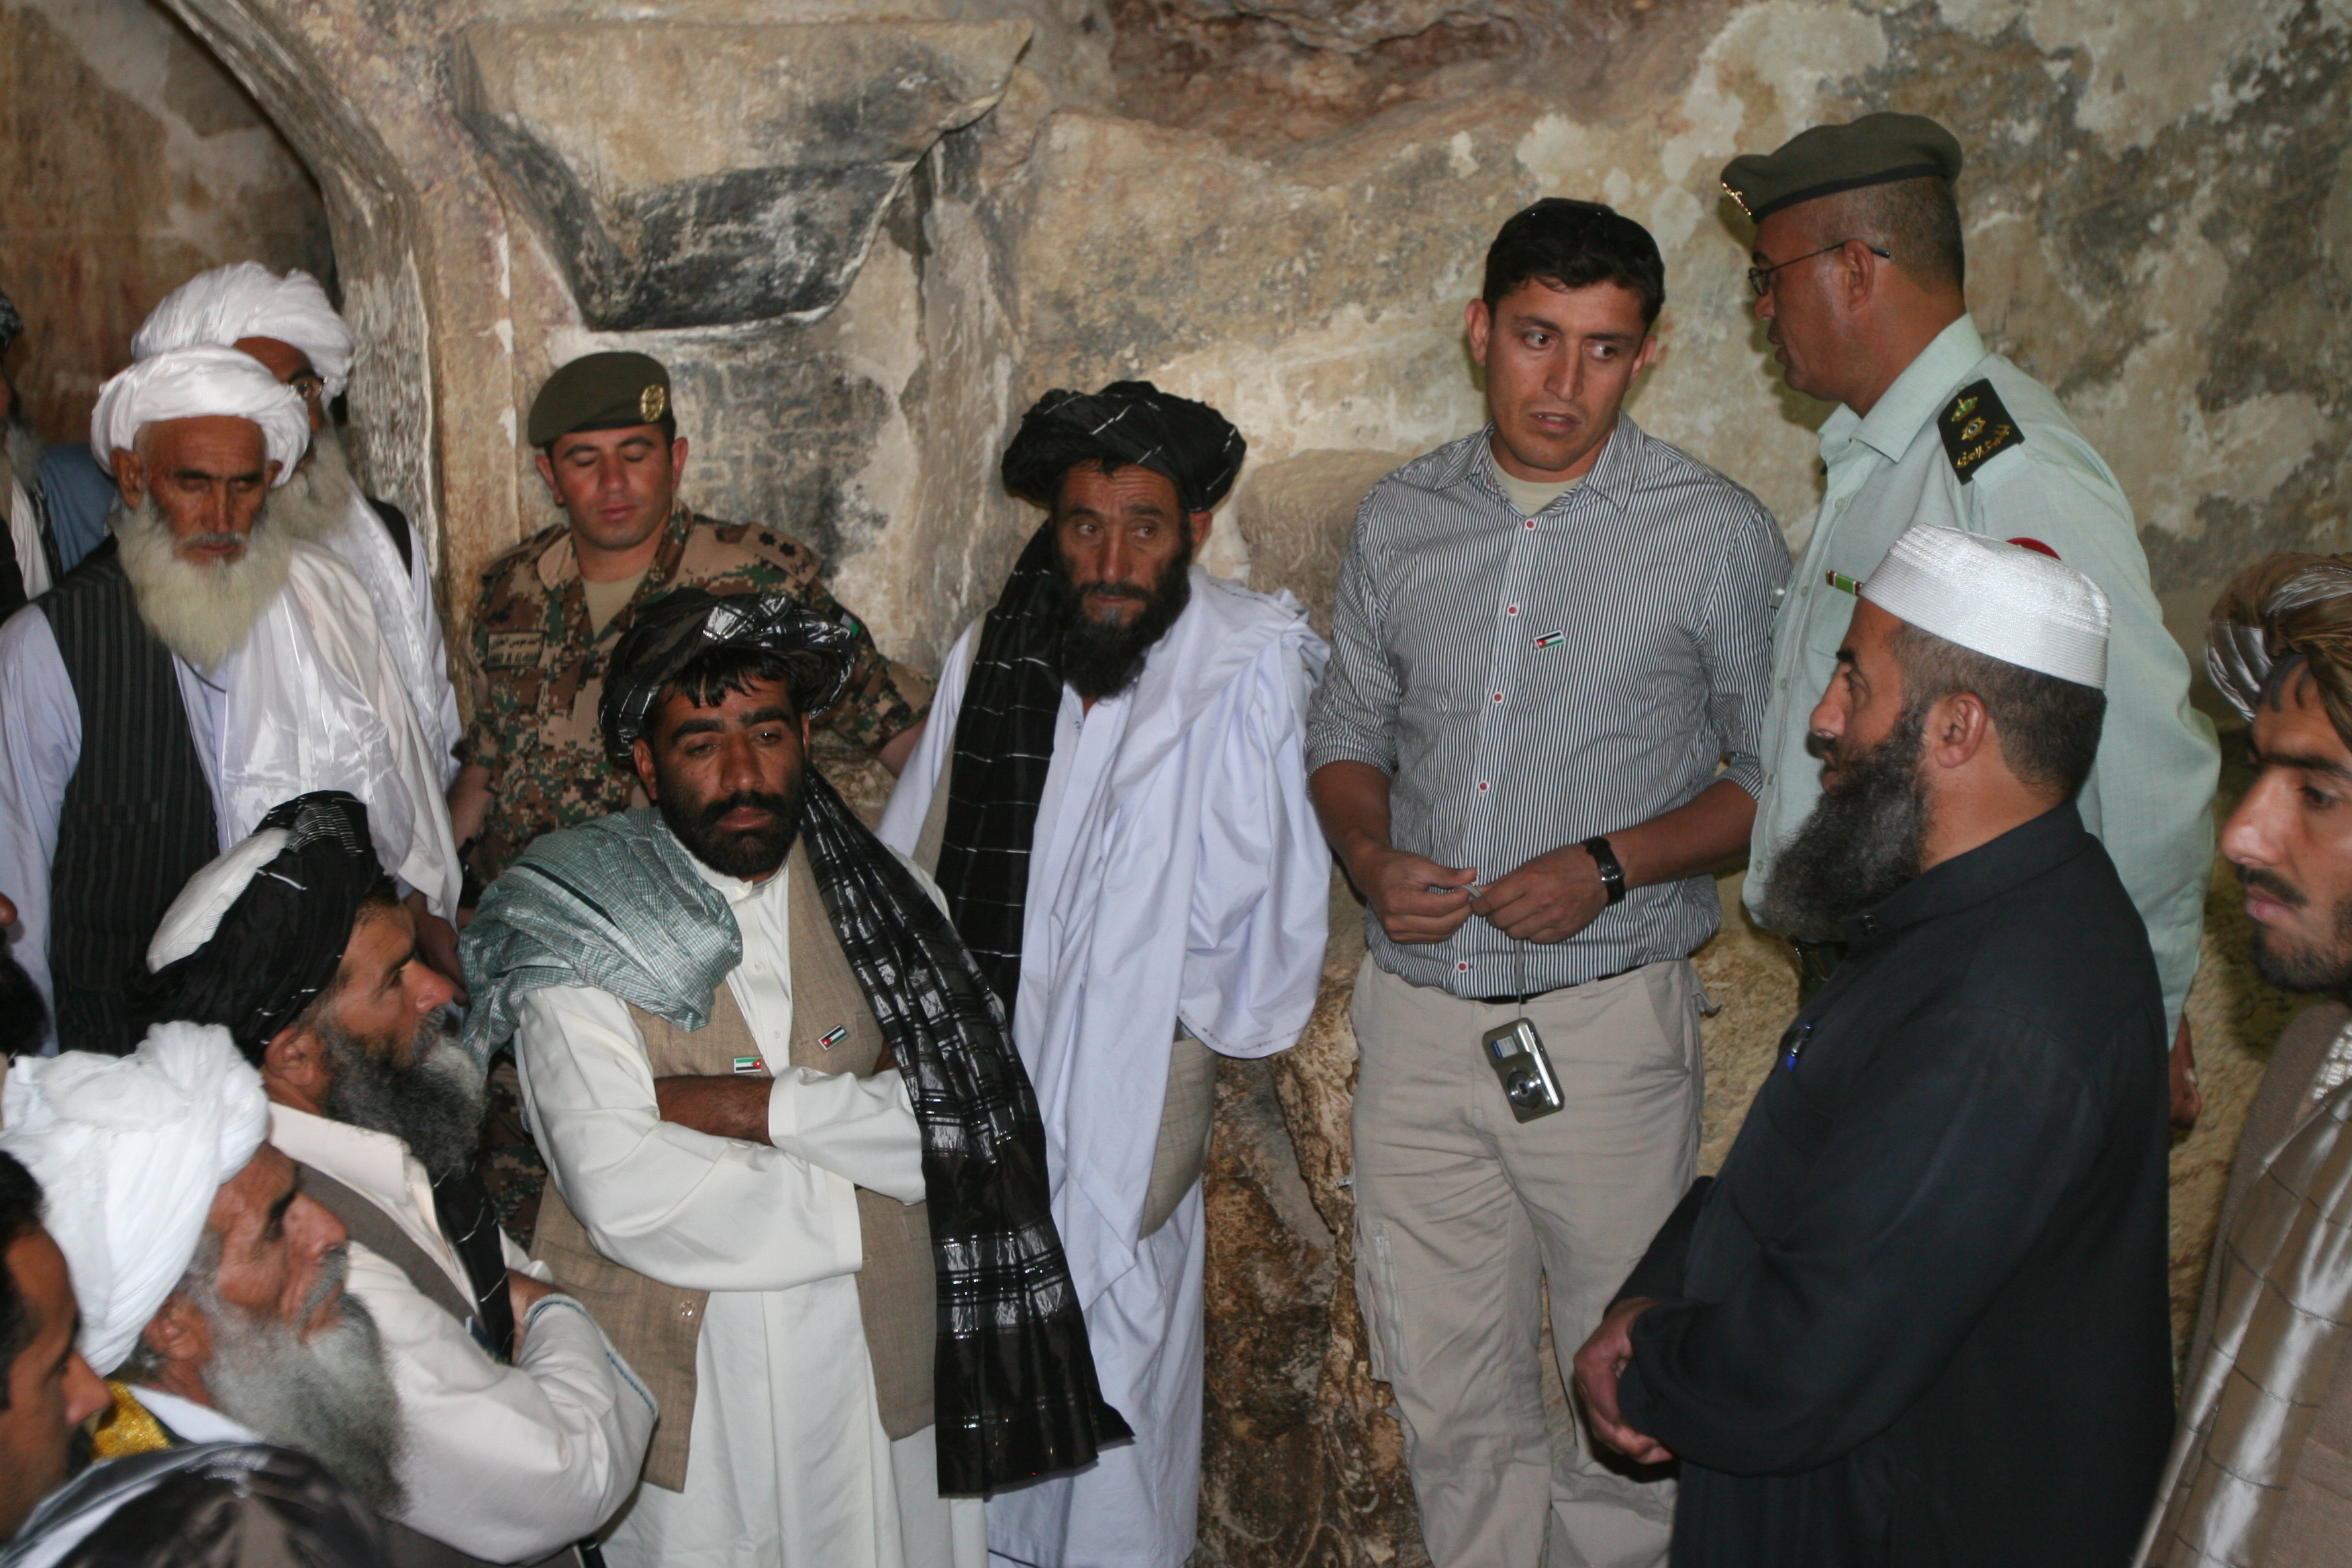 Afghan men dating